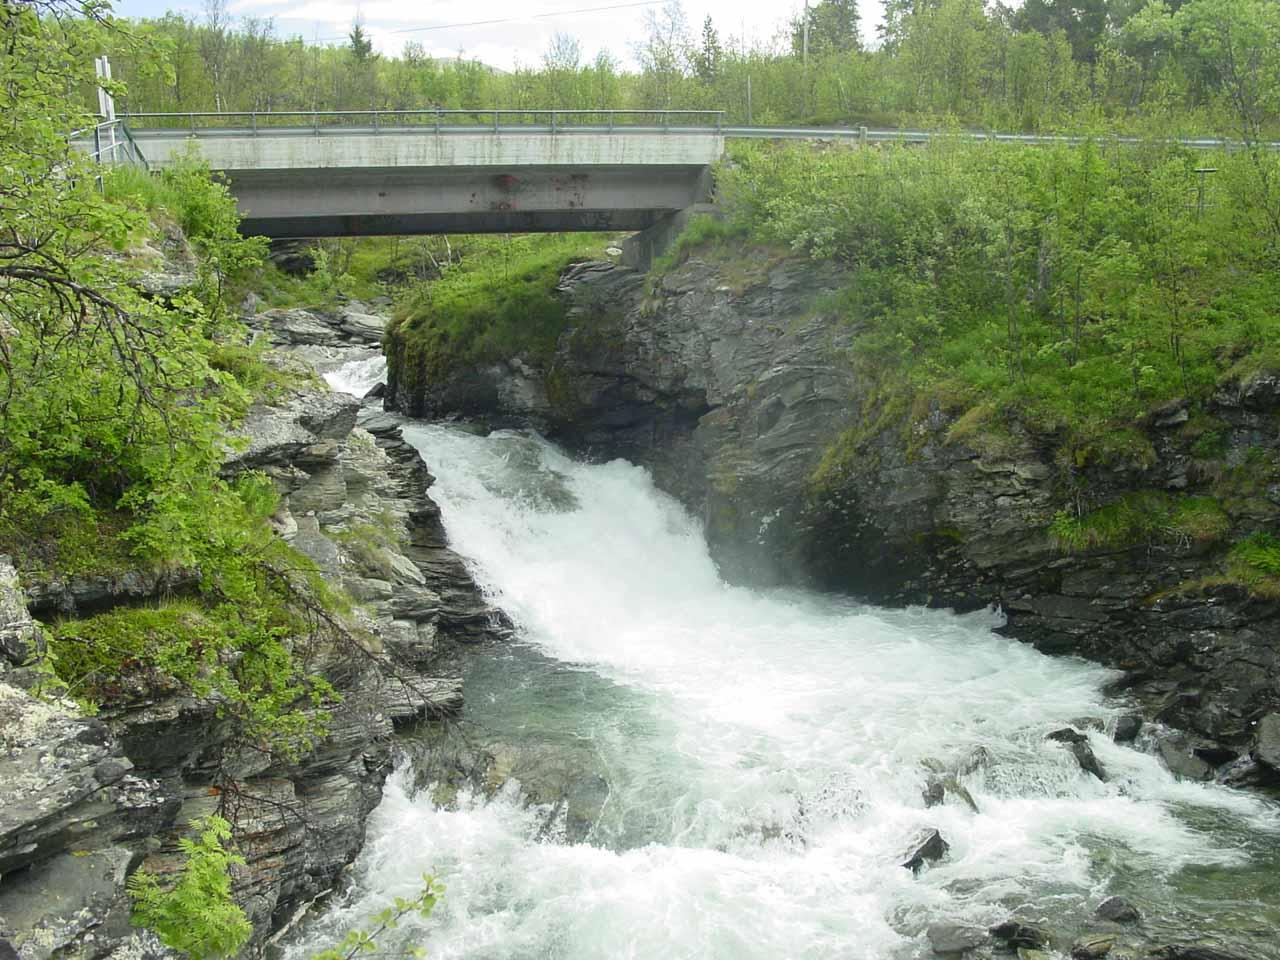 Looking upstream at some cascades where Rovvejohka rushed beneath the E8 road bridge